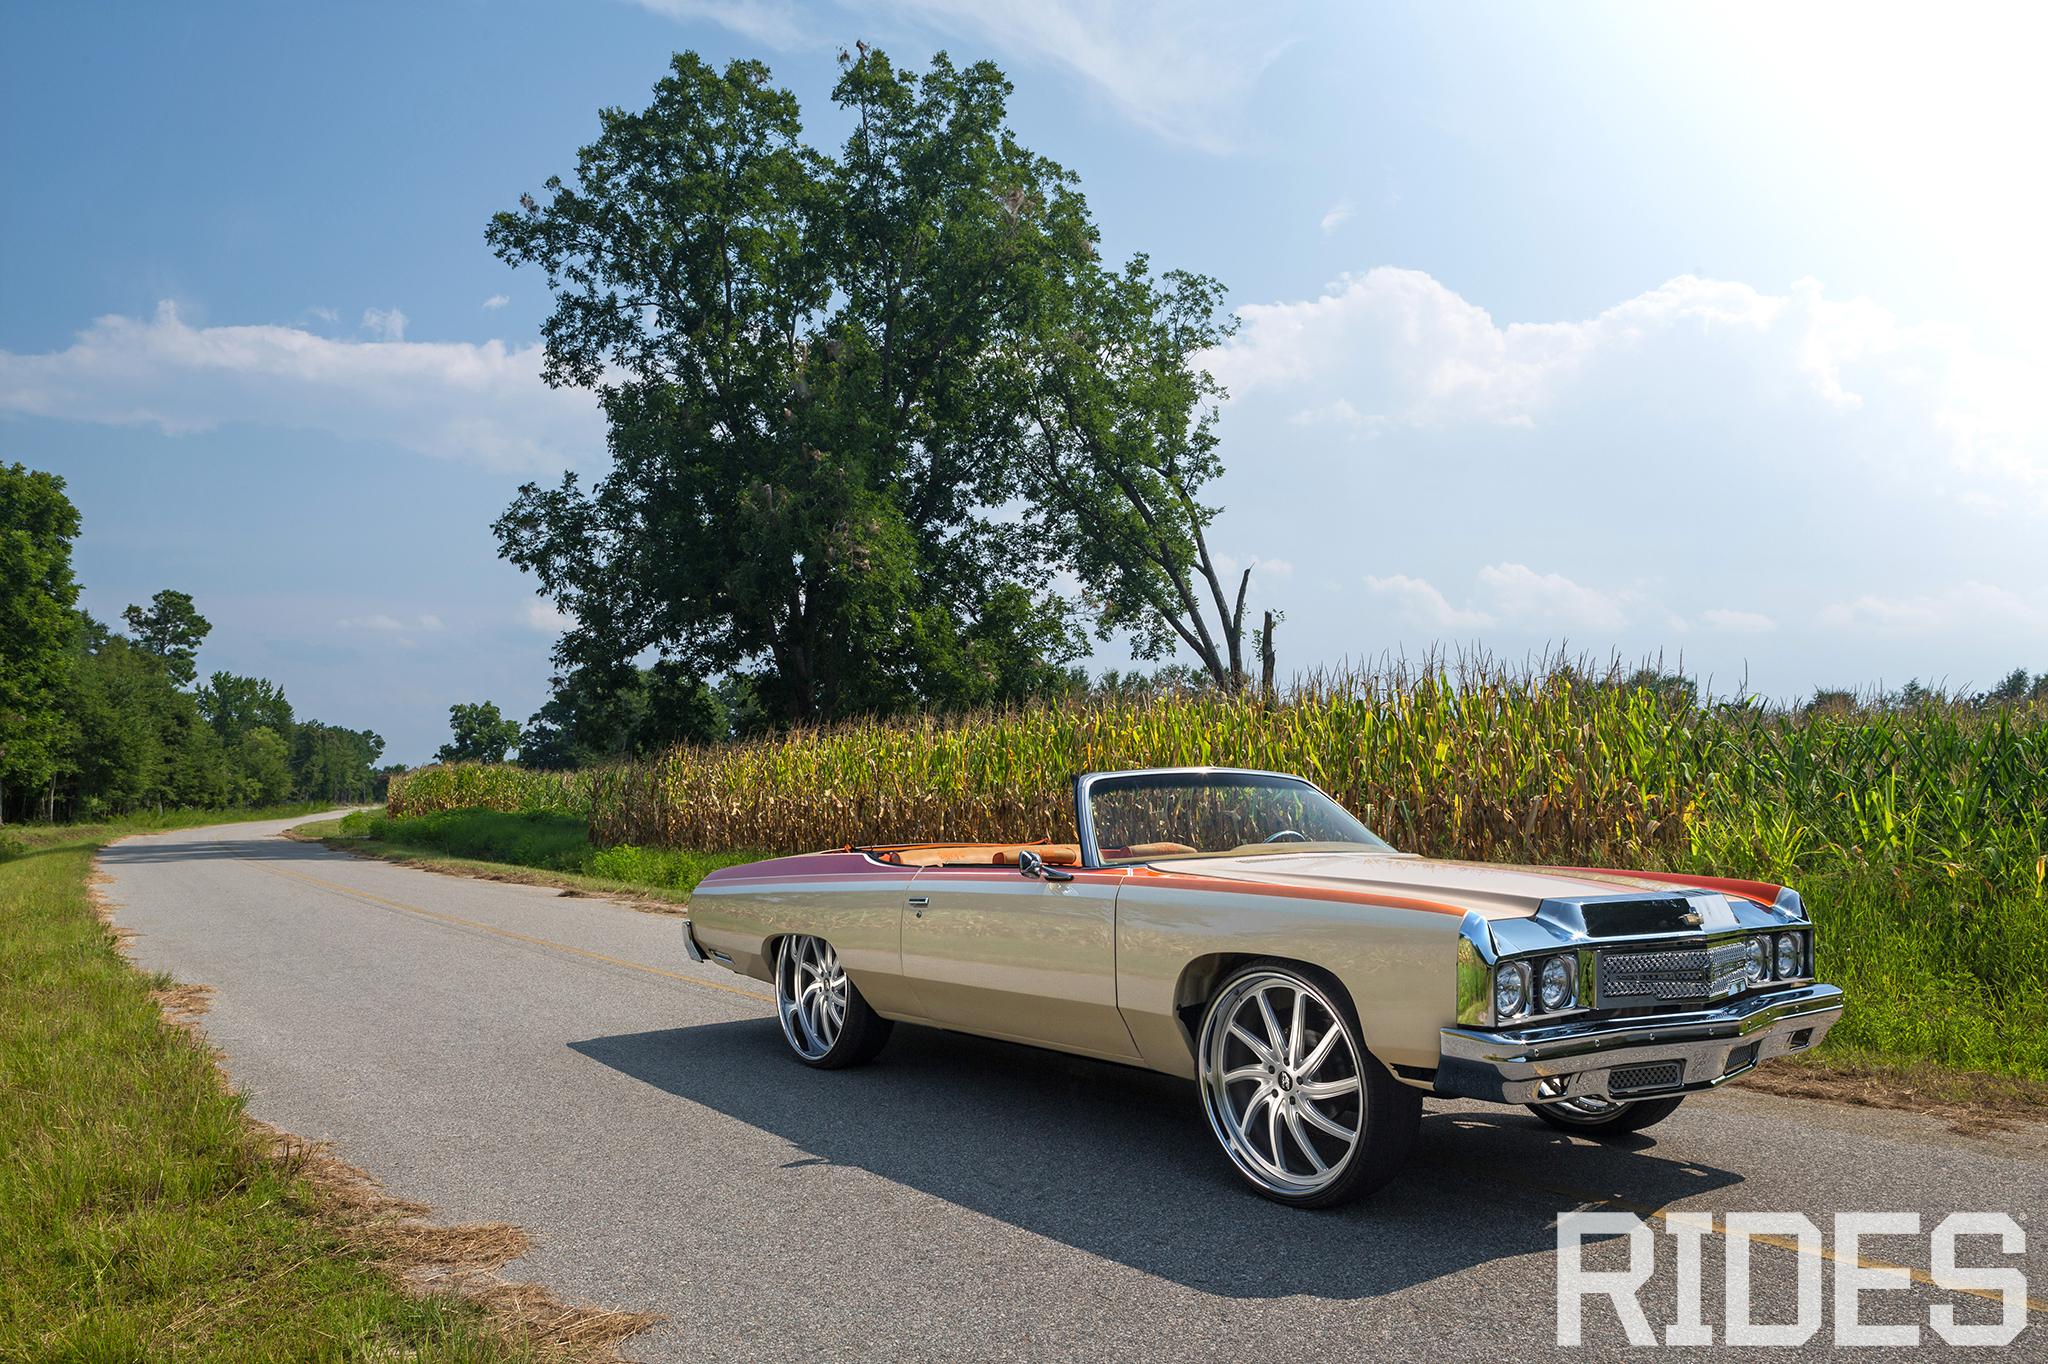 caprice - Rides Magazine